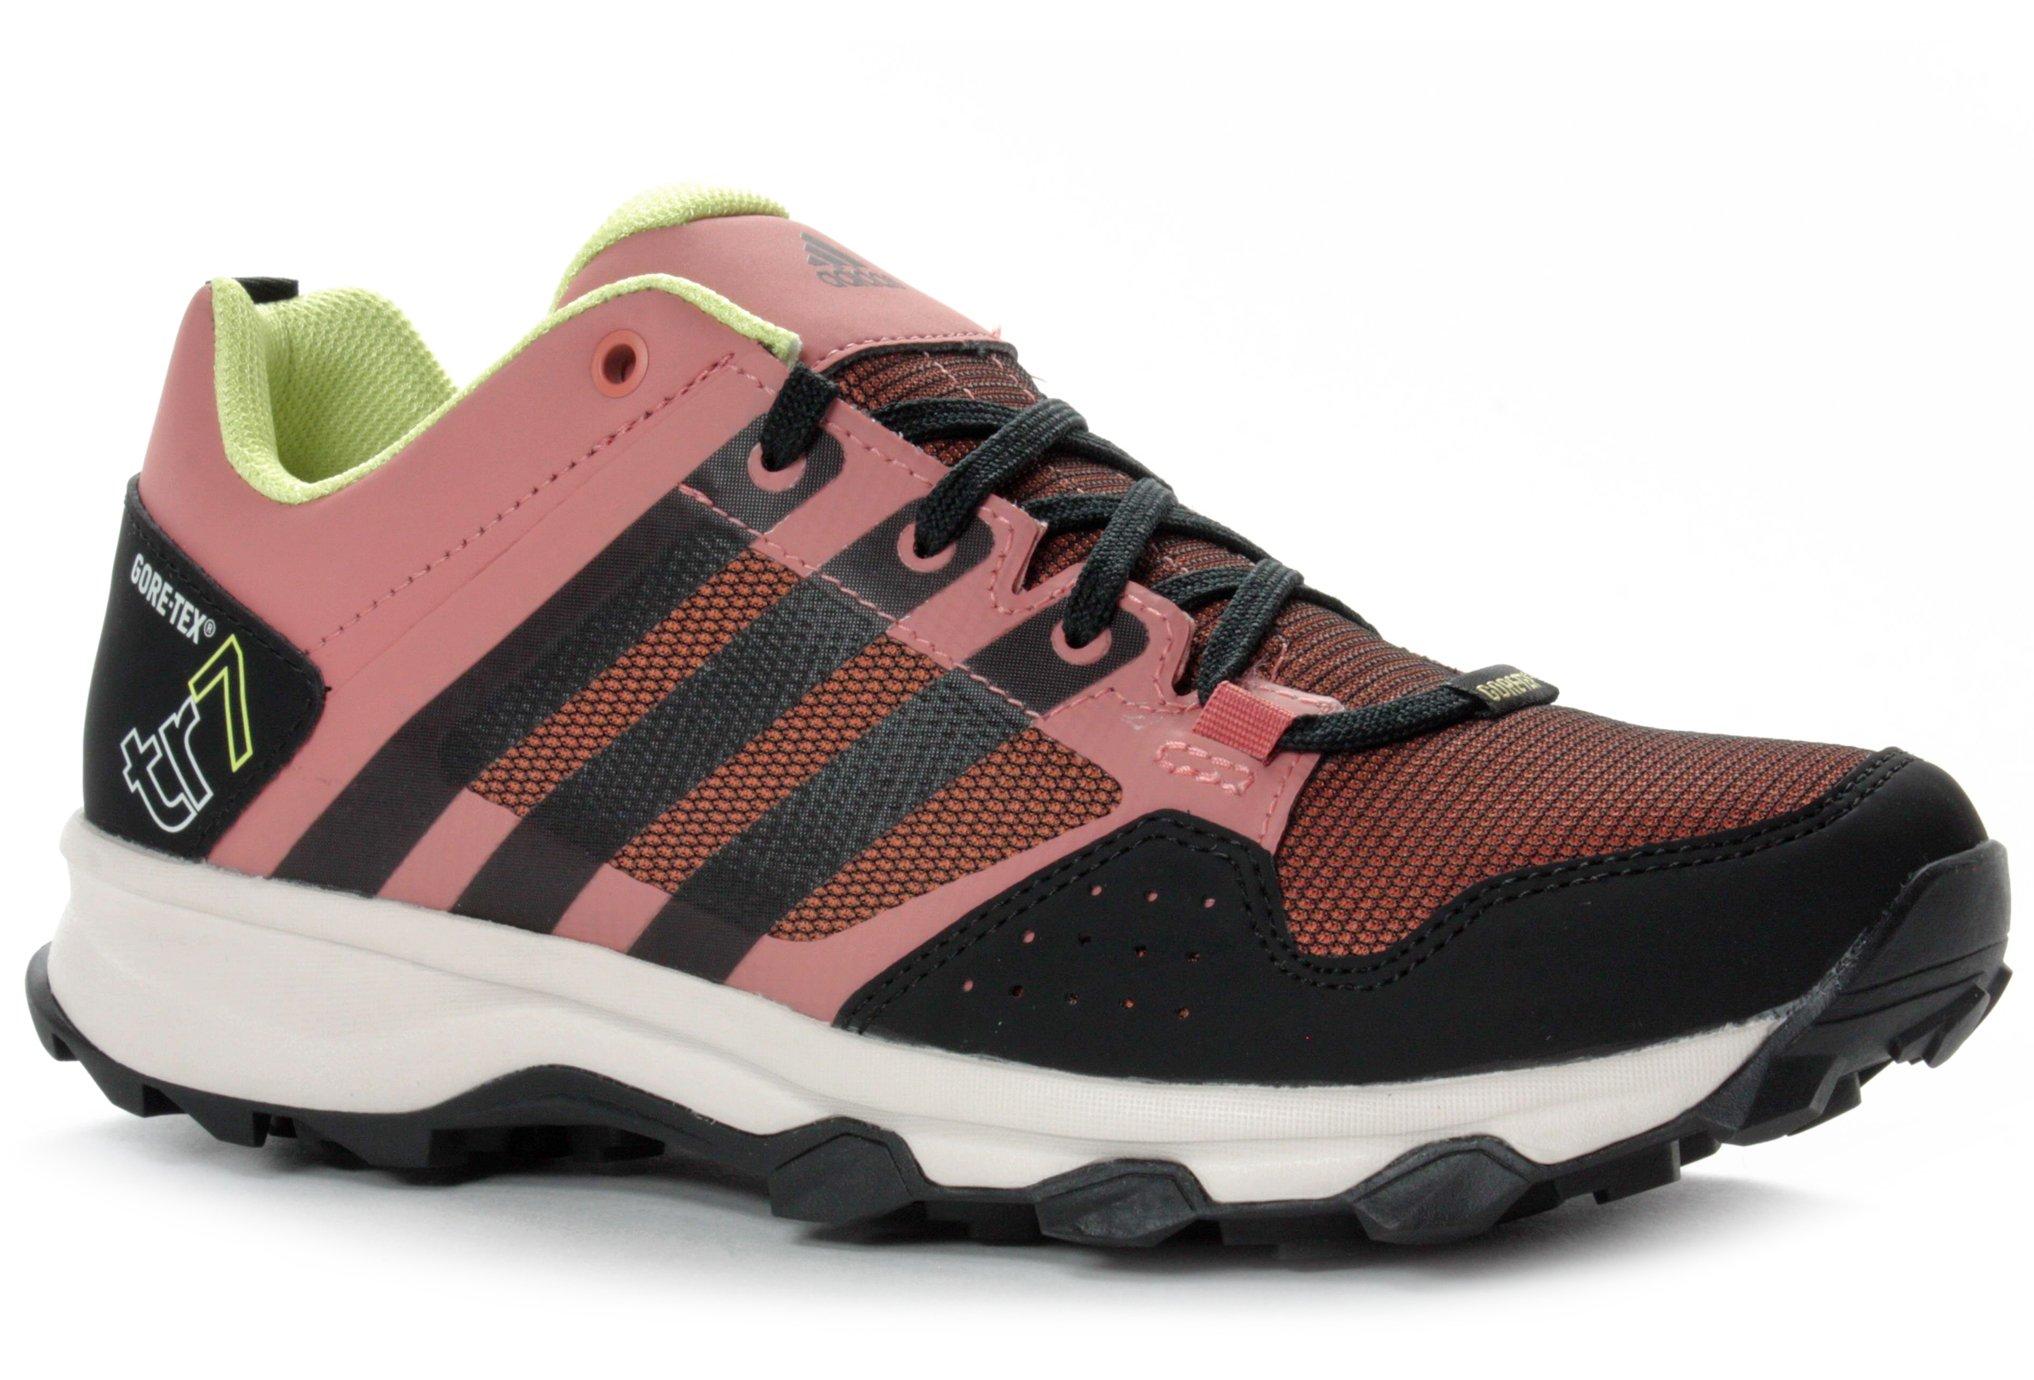 separation shoes 48660 c469b adidas Kanadia 7 TR Gore-Tex W femme Rose pas cher